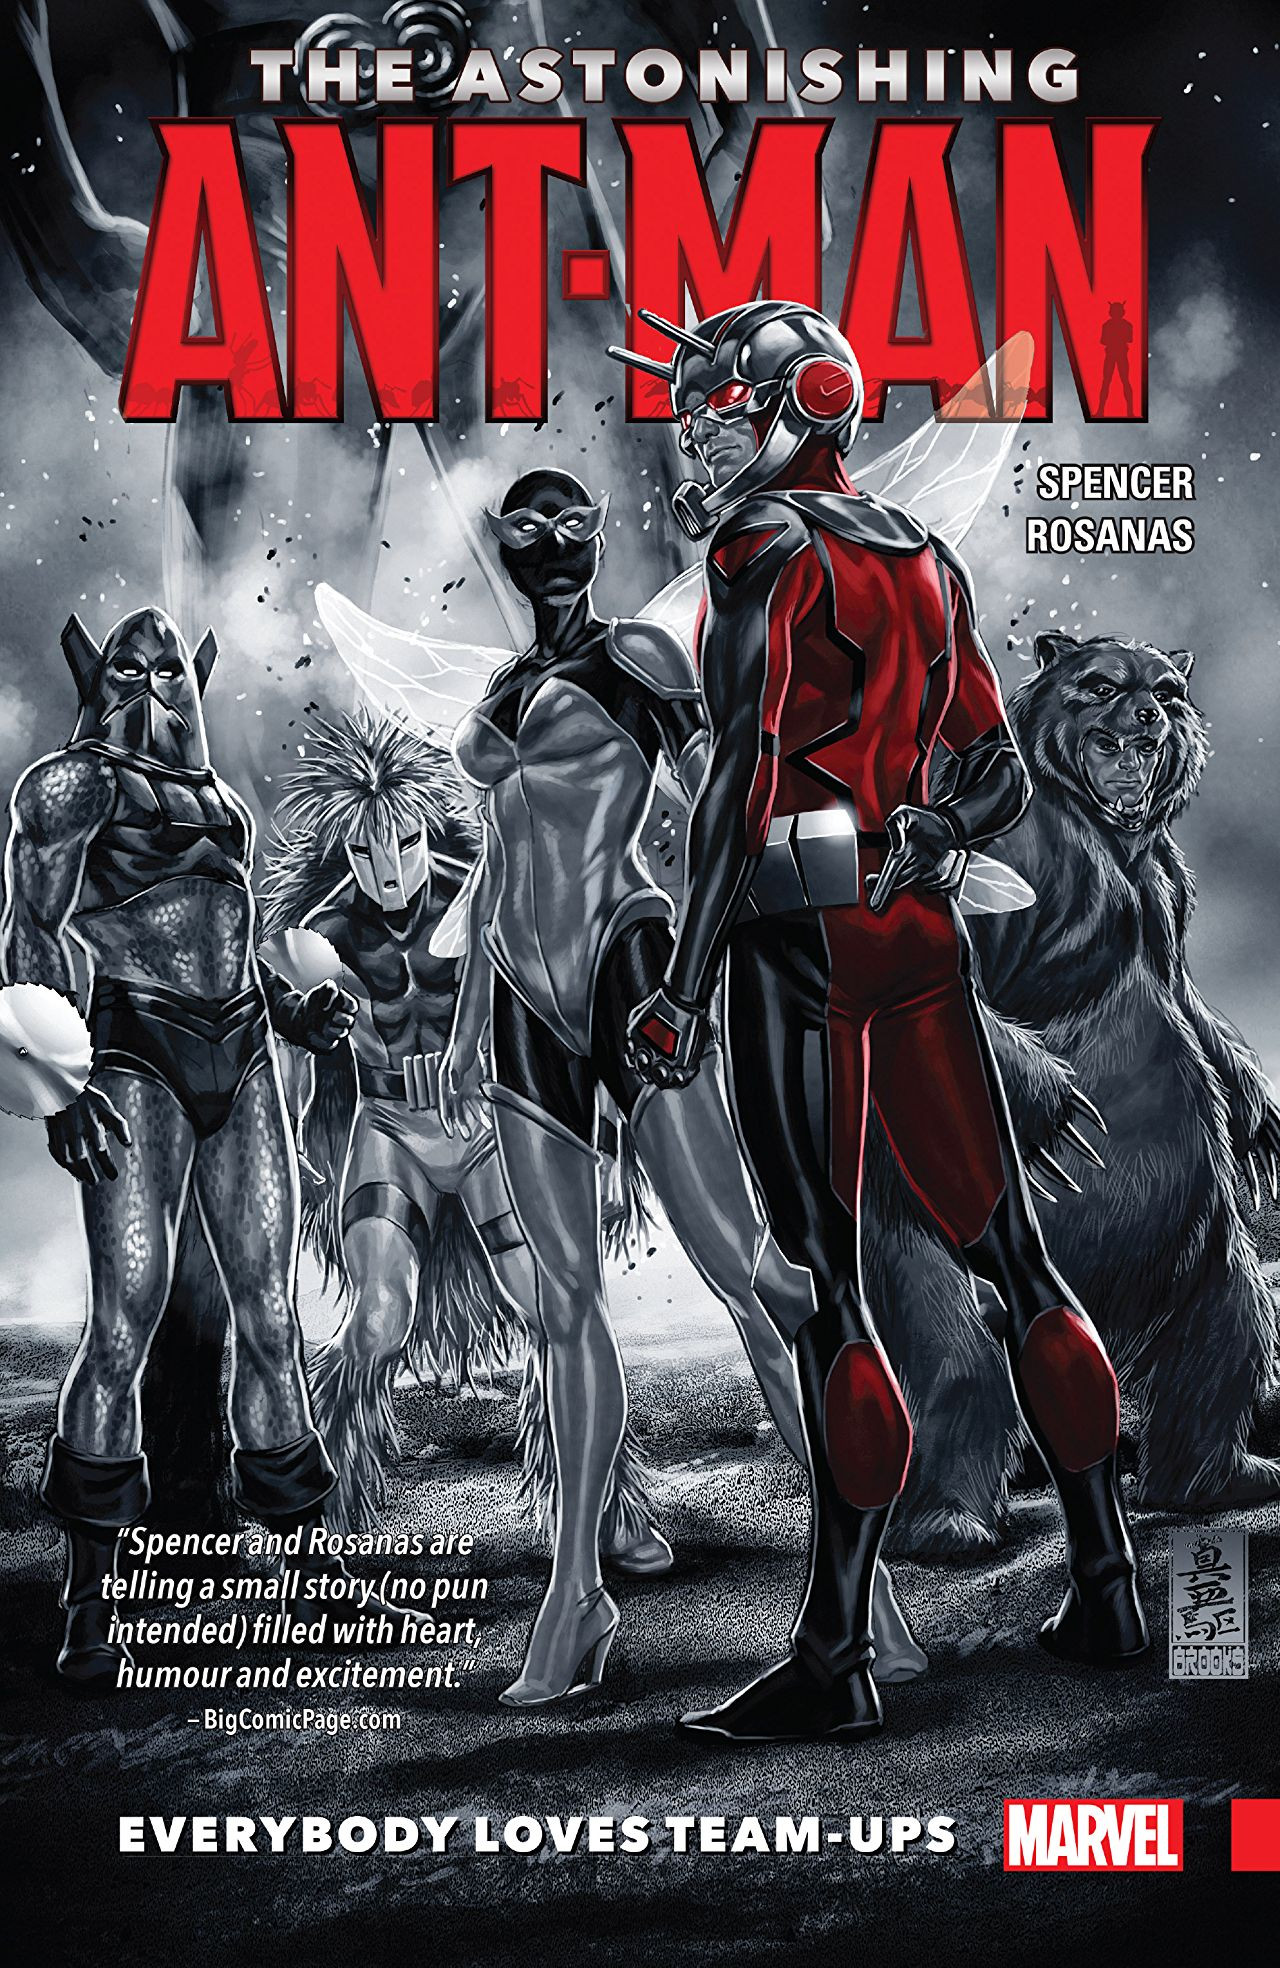 Astonishing Ant-Man TPB Vol 1 1: Everybody Loves Team-Ups